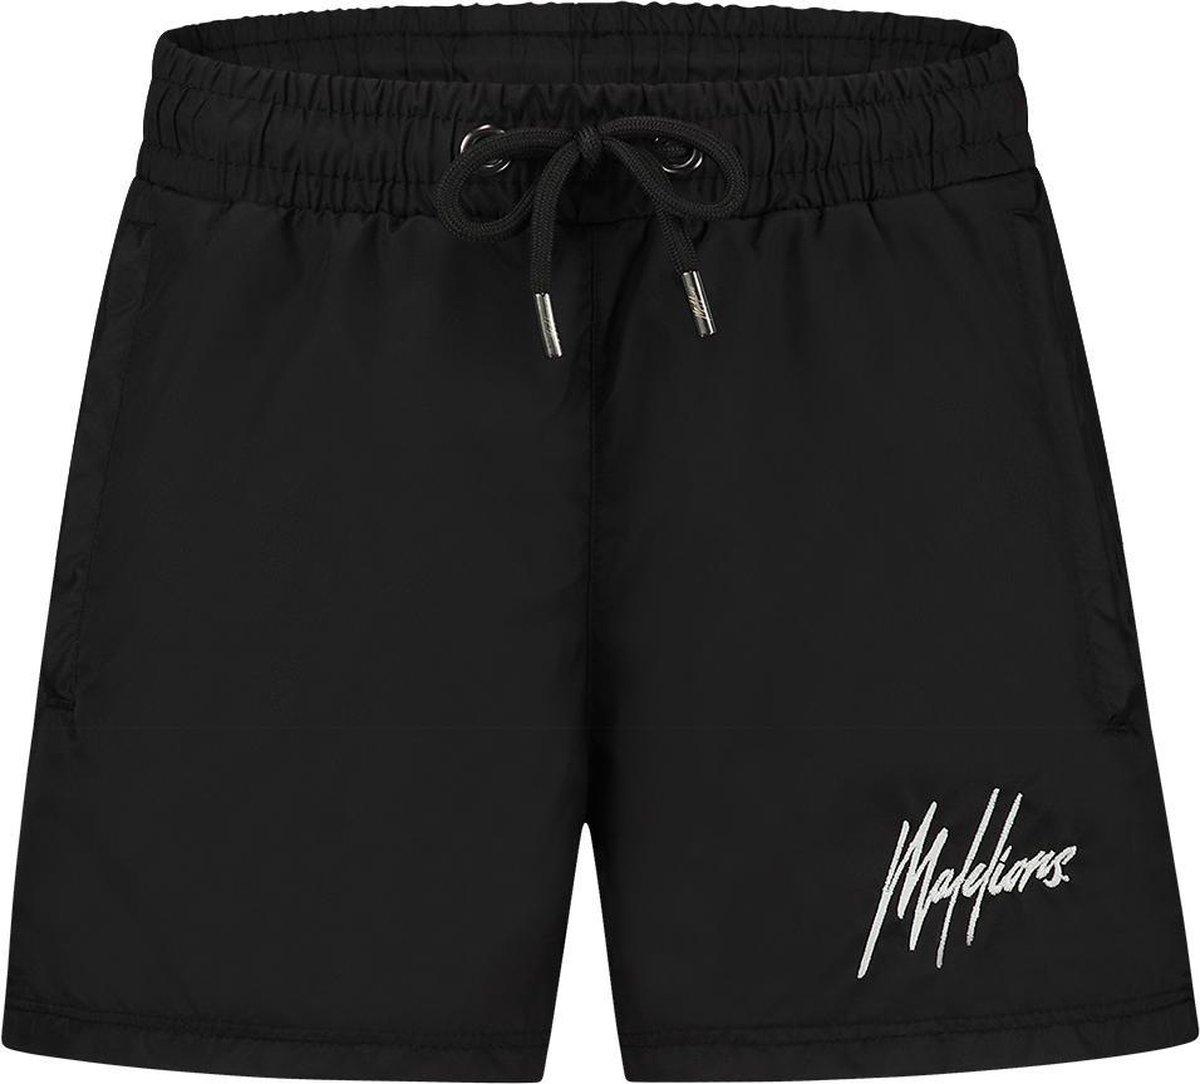 Malelions Junior Francisco Swimshort - Black/Glow In The Dark - 14   164